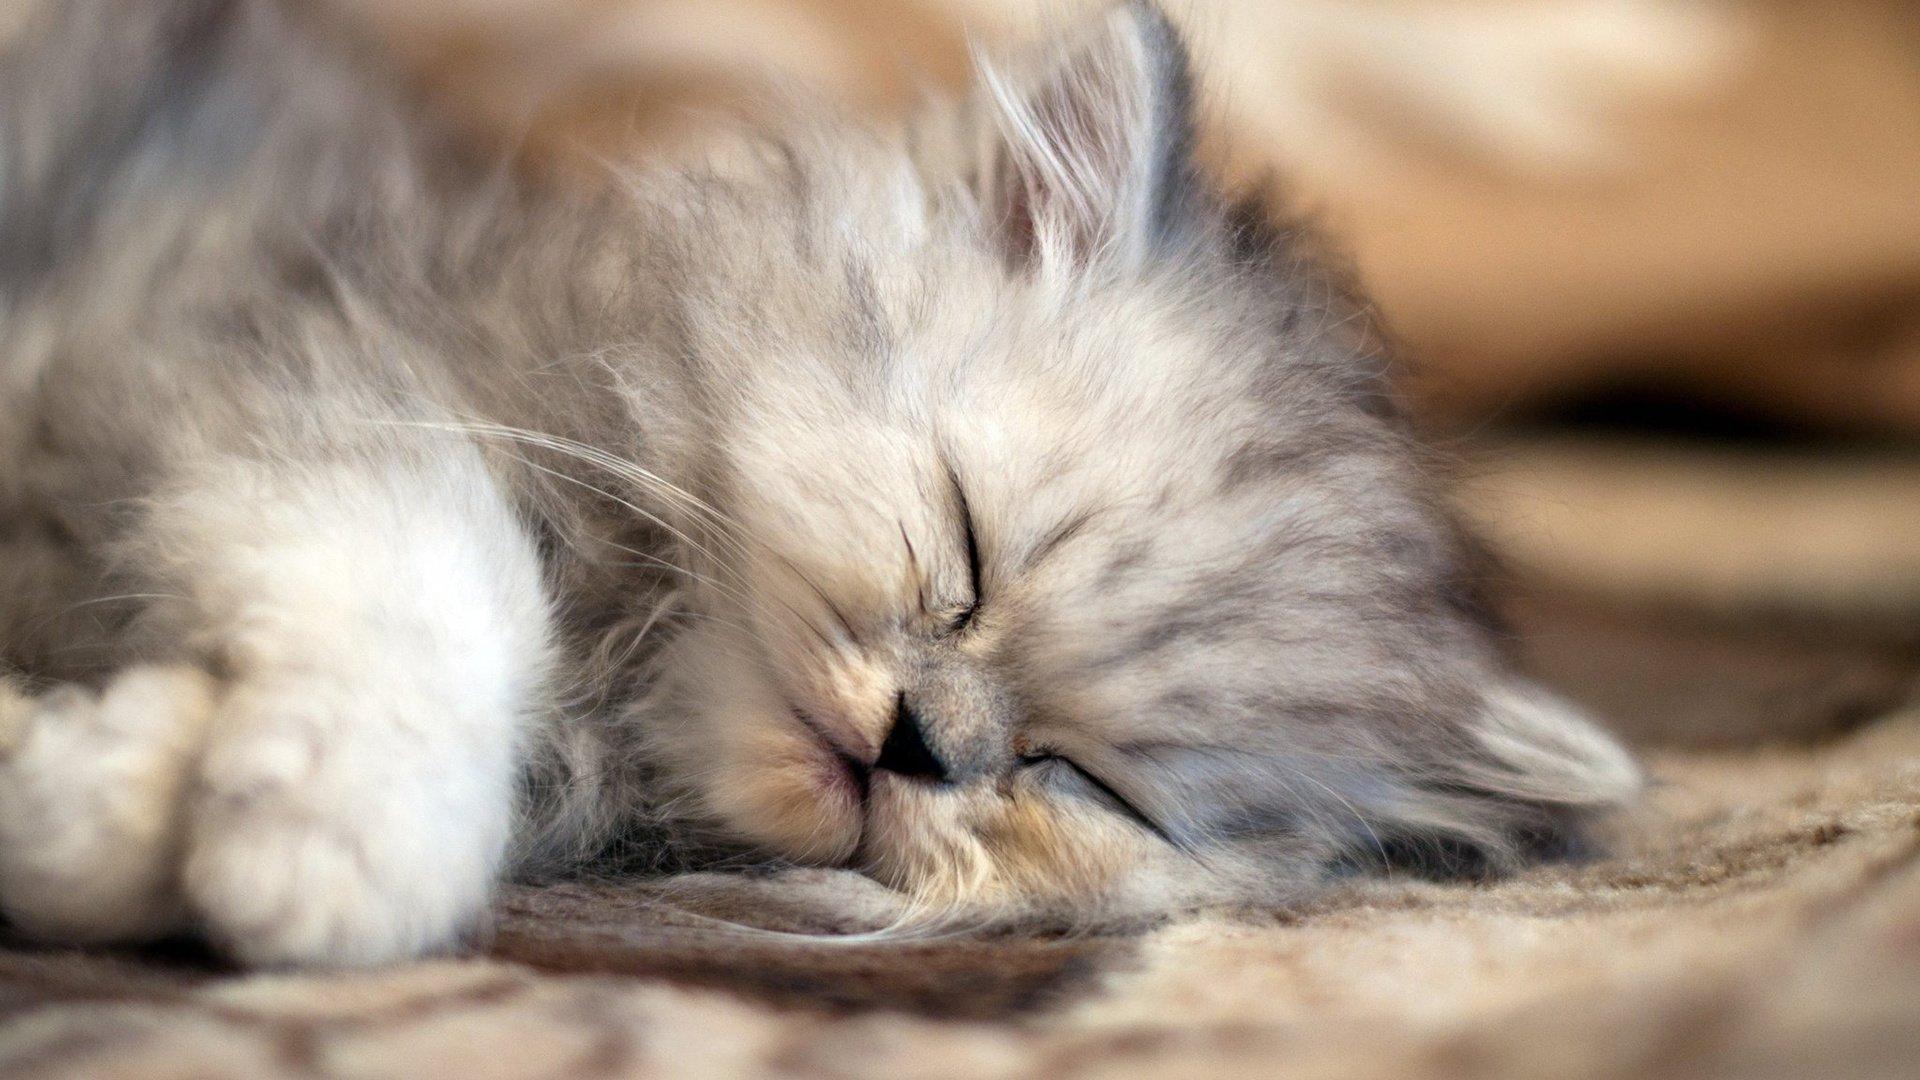 фото сладкие кошечки его